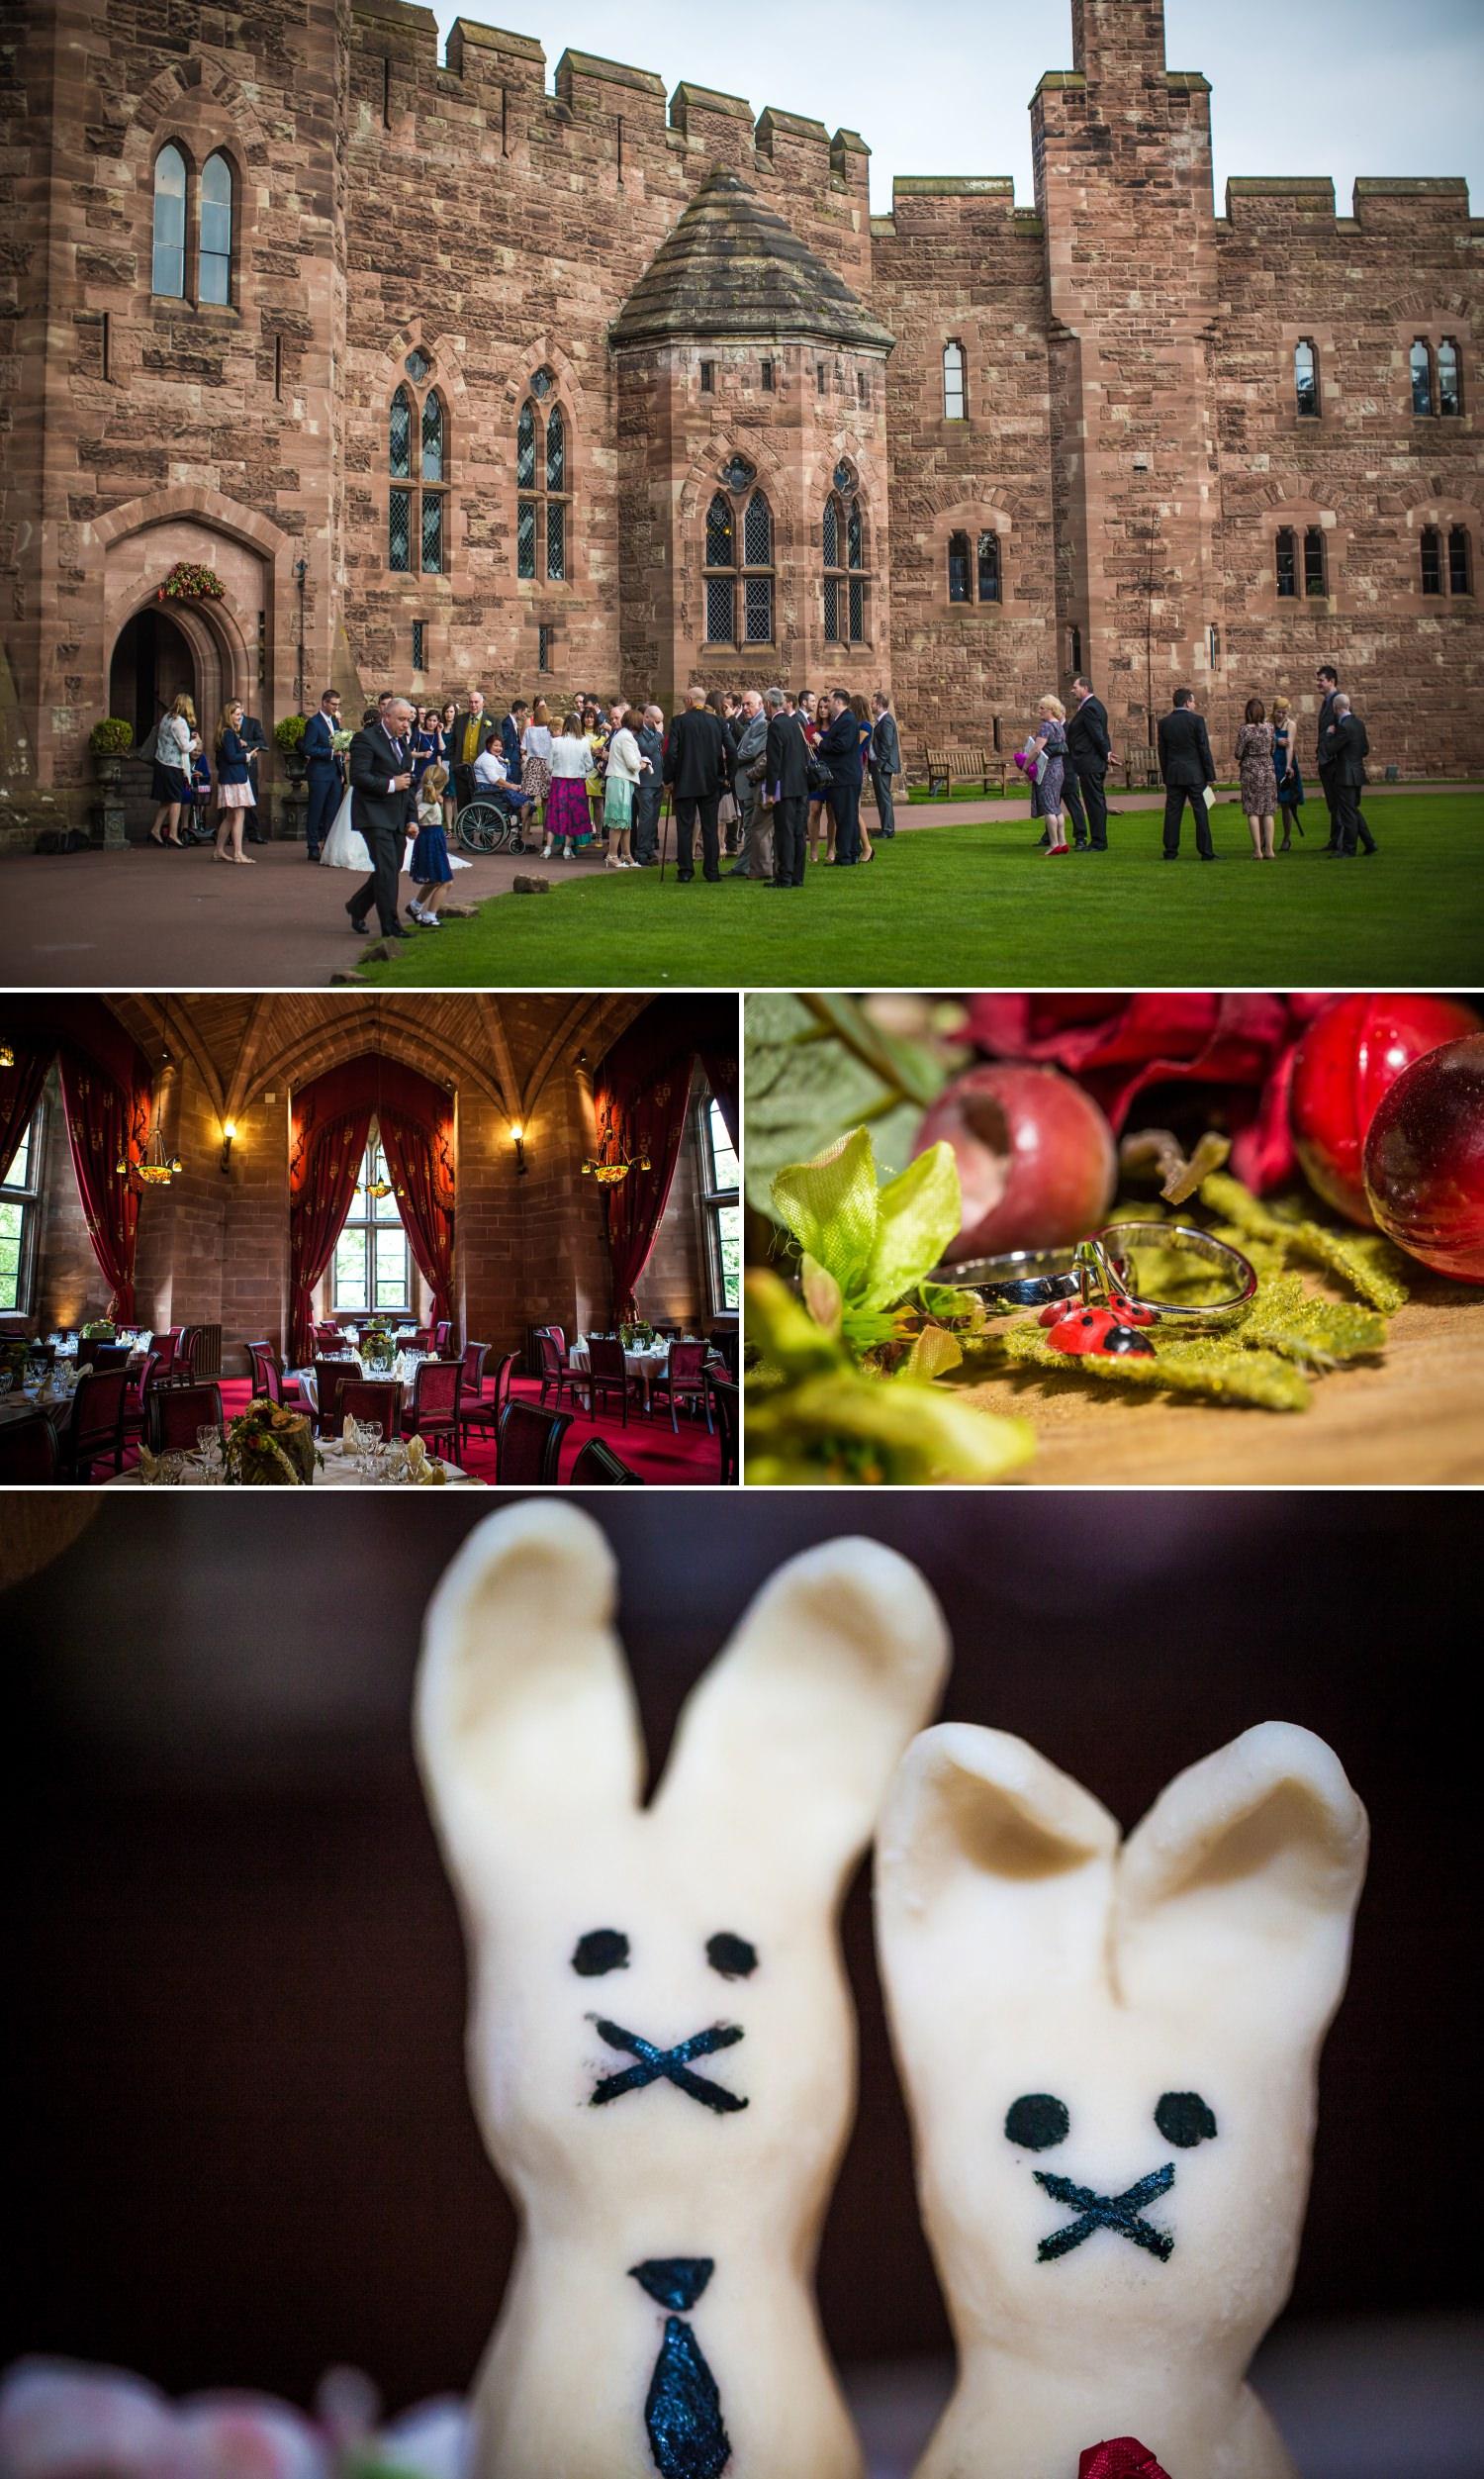 wedding photography details at Peckforton Castle, Chester